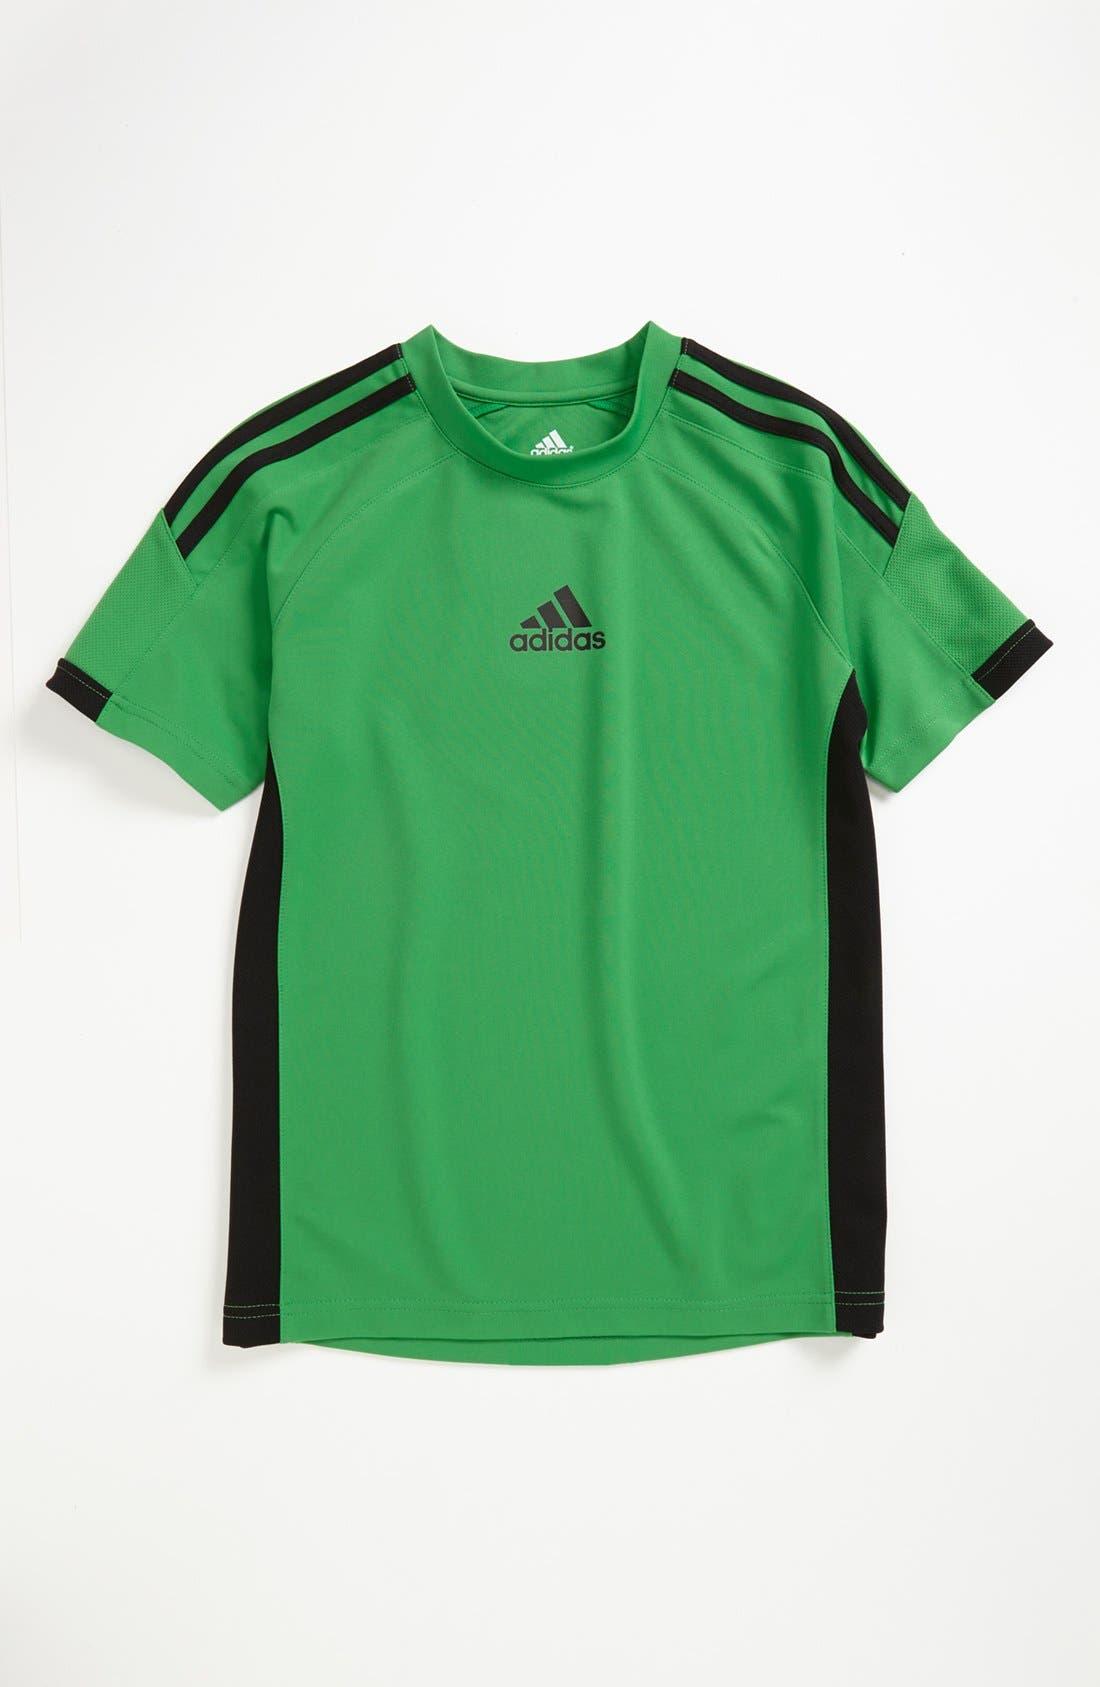 Alternate Image 1 Selected - adidas 'Special Event' T-Shirt (Big Boys)